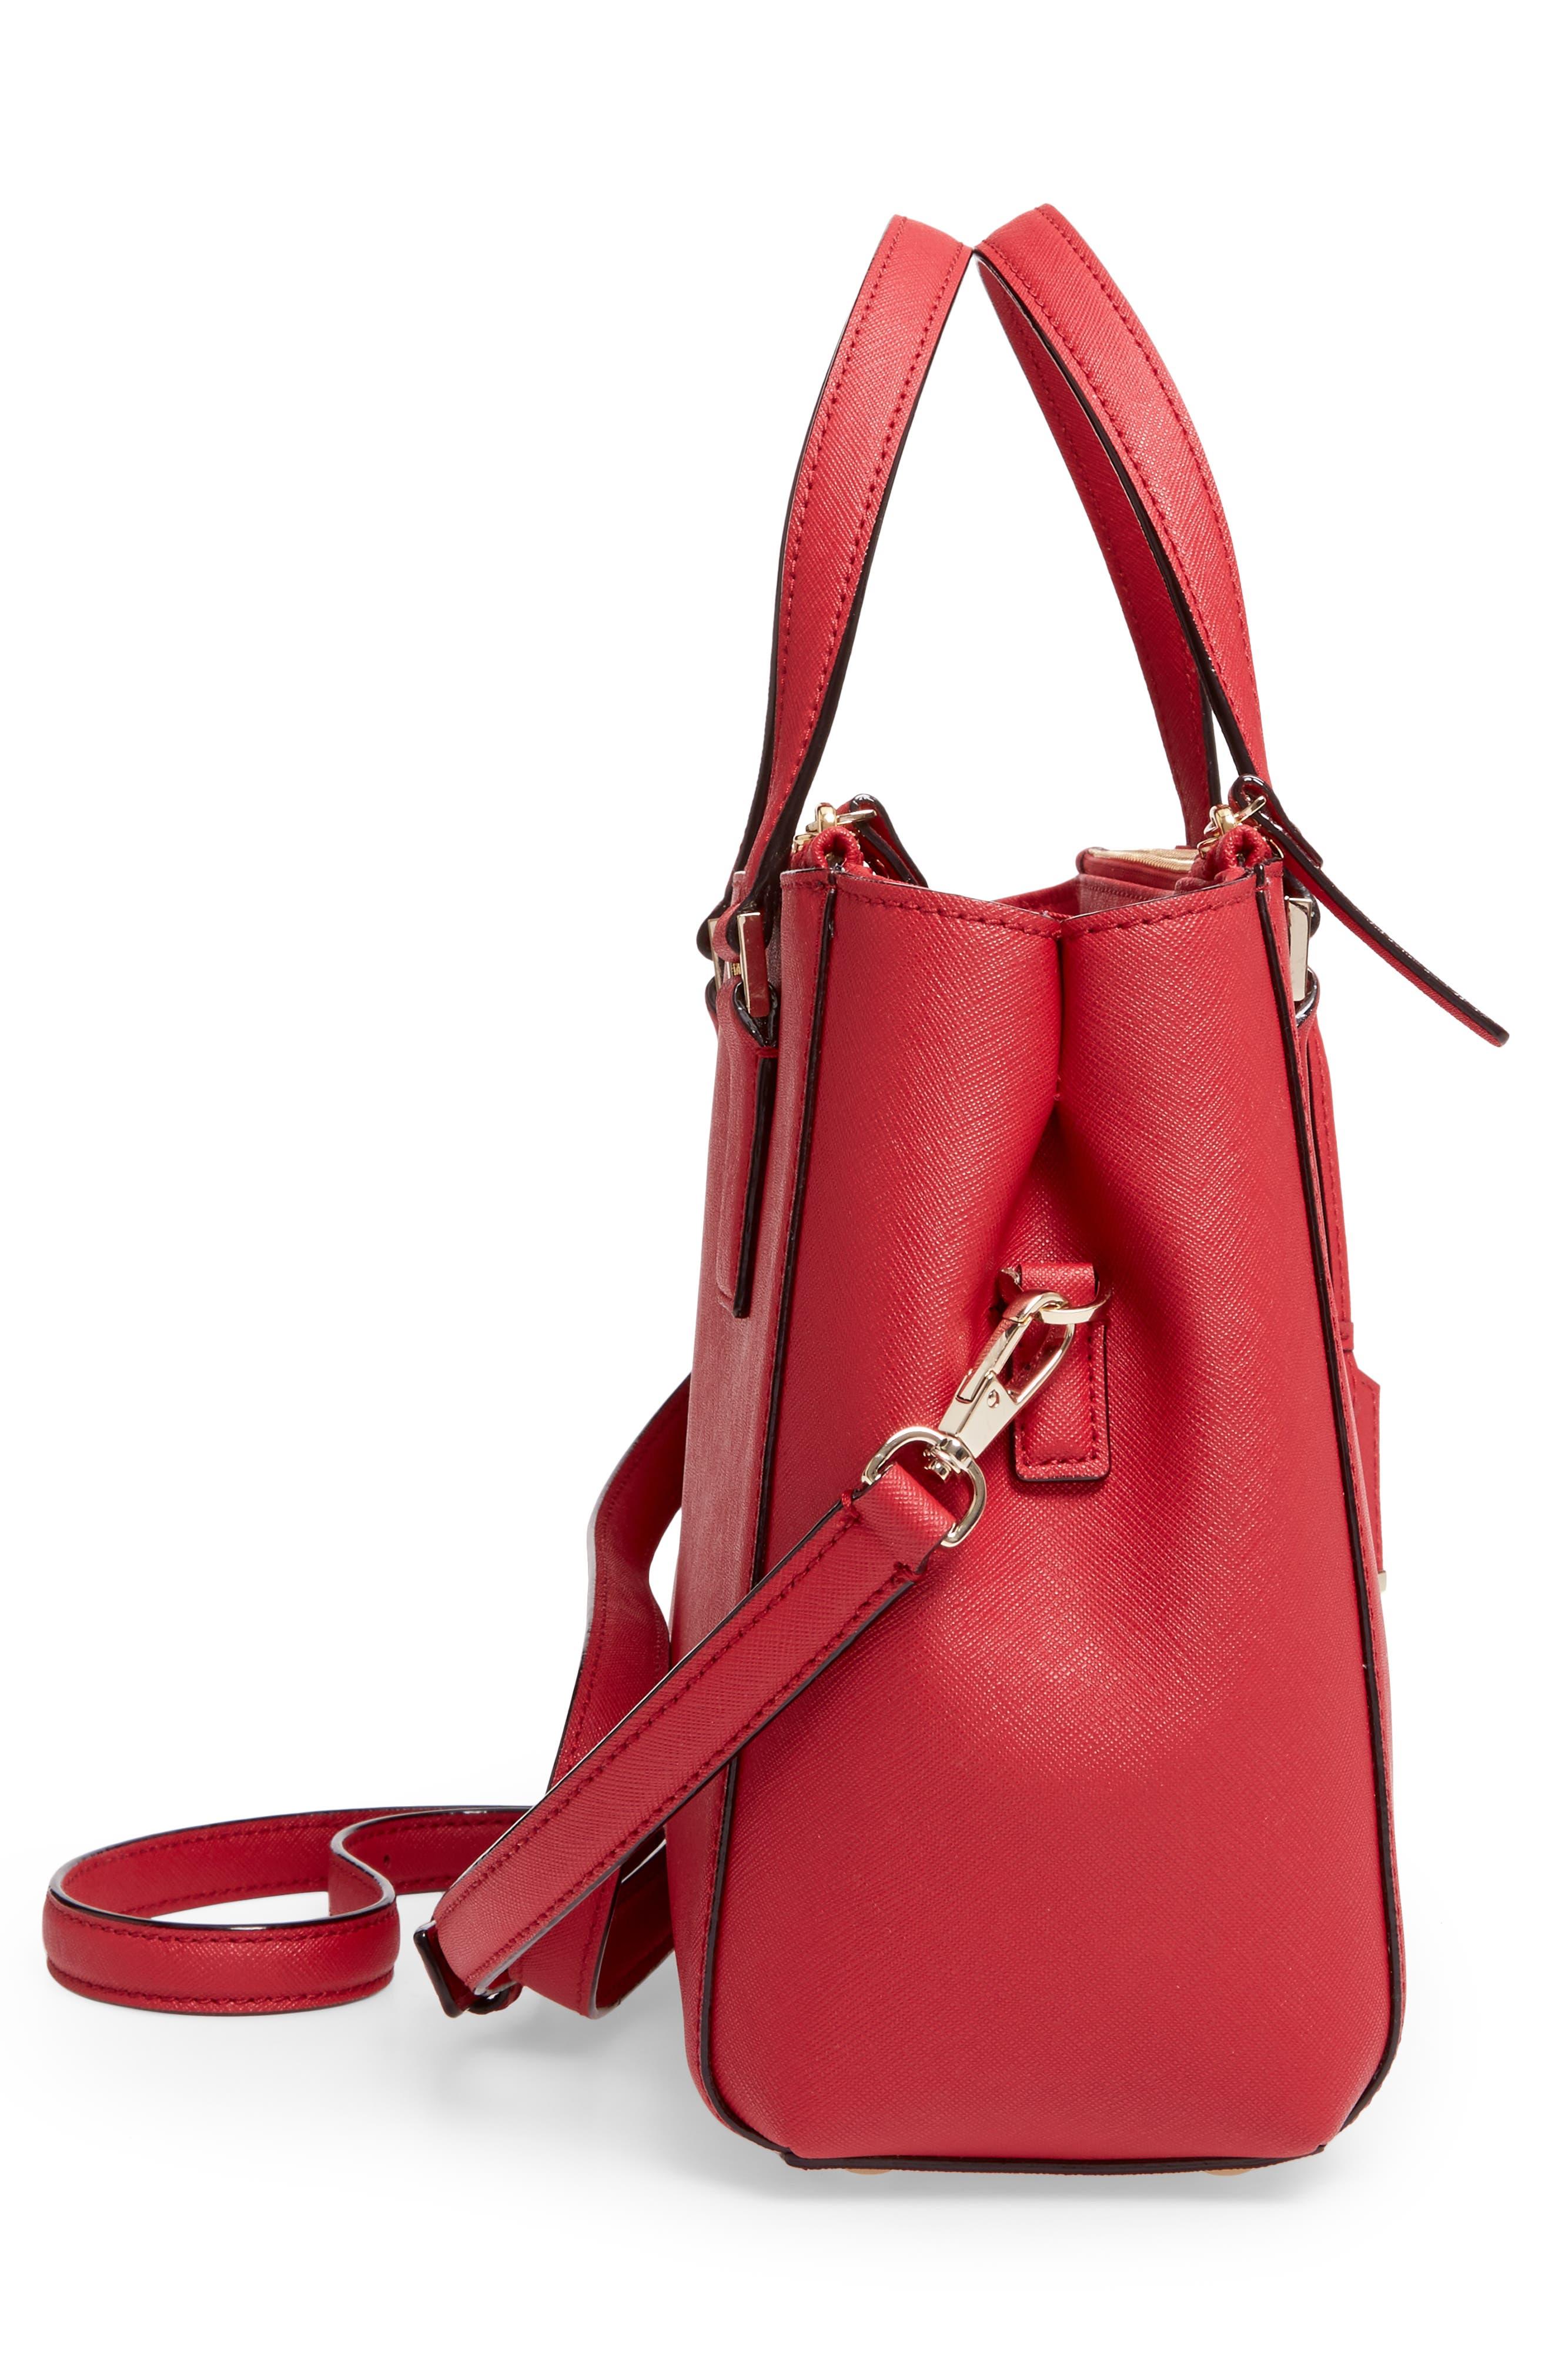 cameron street - teegan calfskin leather satchel,                             Alternate thumbnail 5, color,                             638